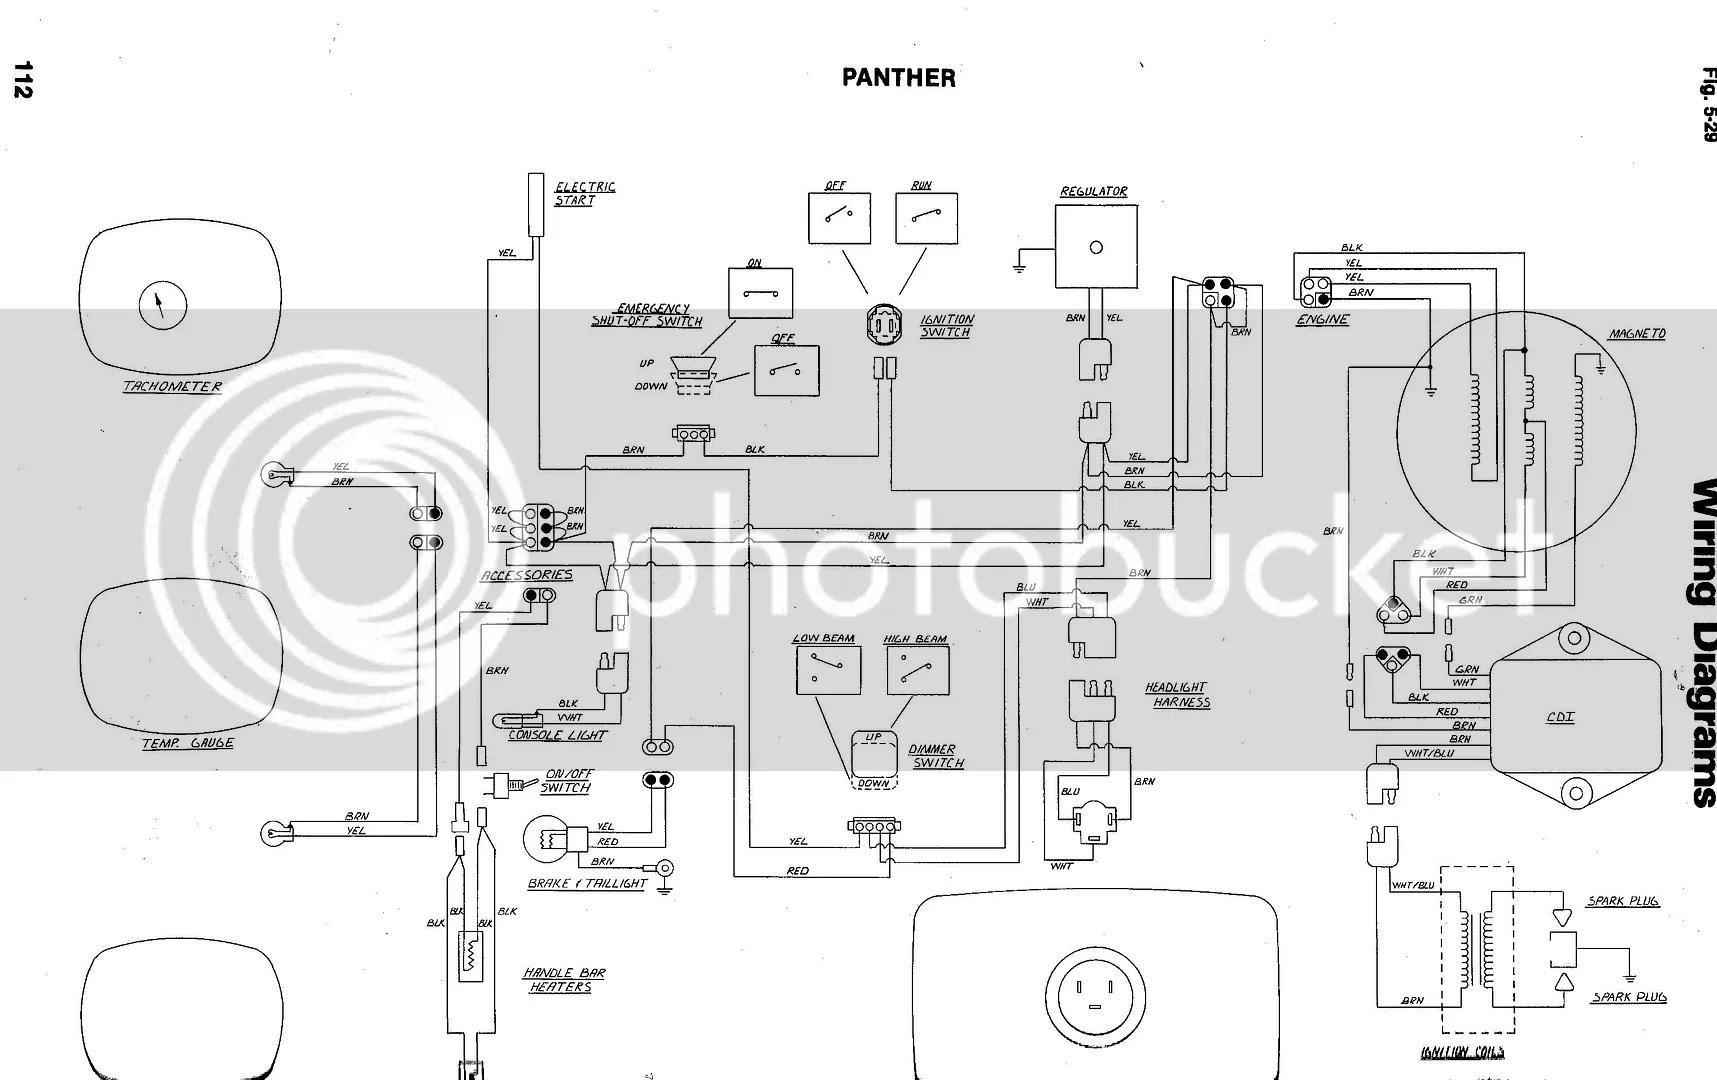 1996 polari indy 500 wiring diagram polaris trail boss vacuum 1998 Ezgo Wiring Diagram hight resolution of wire diagram 98 ski doo touring wiring diagrams scematic 1998 polaris xc 600